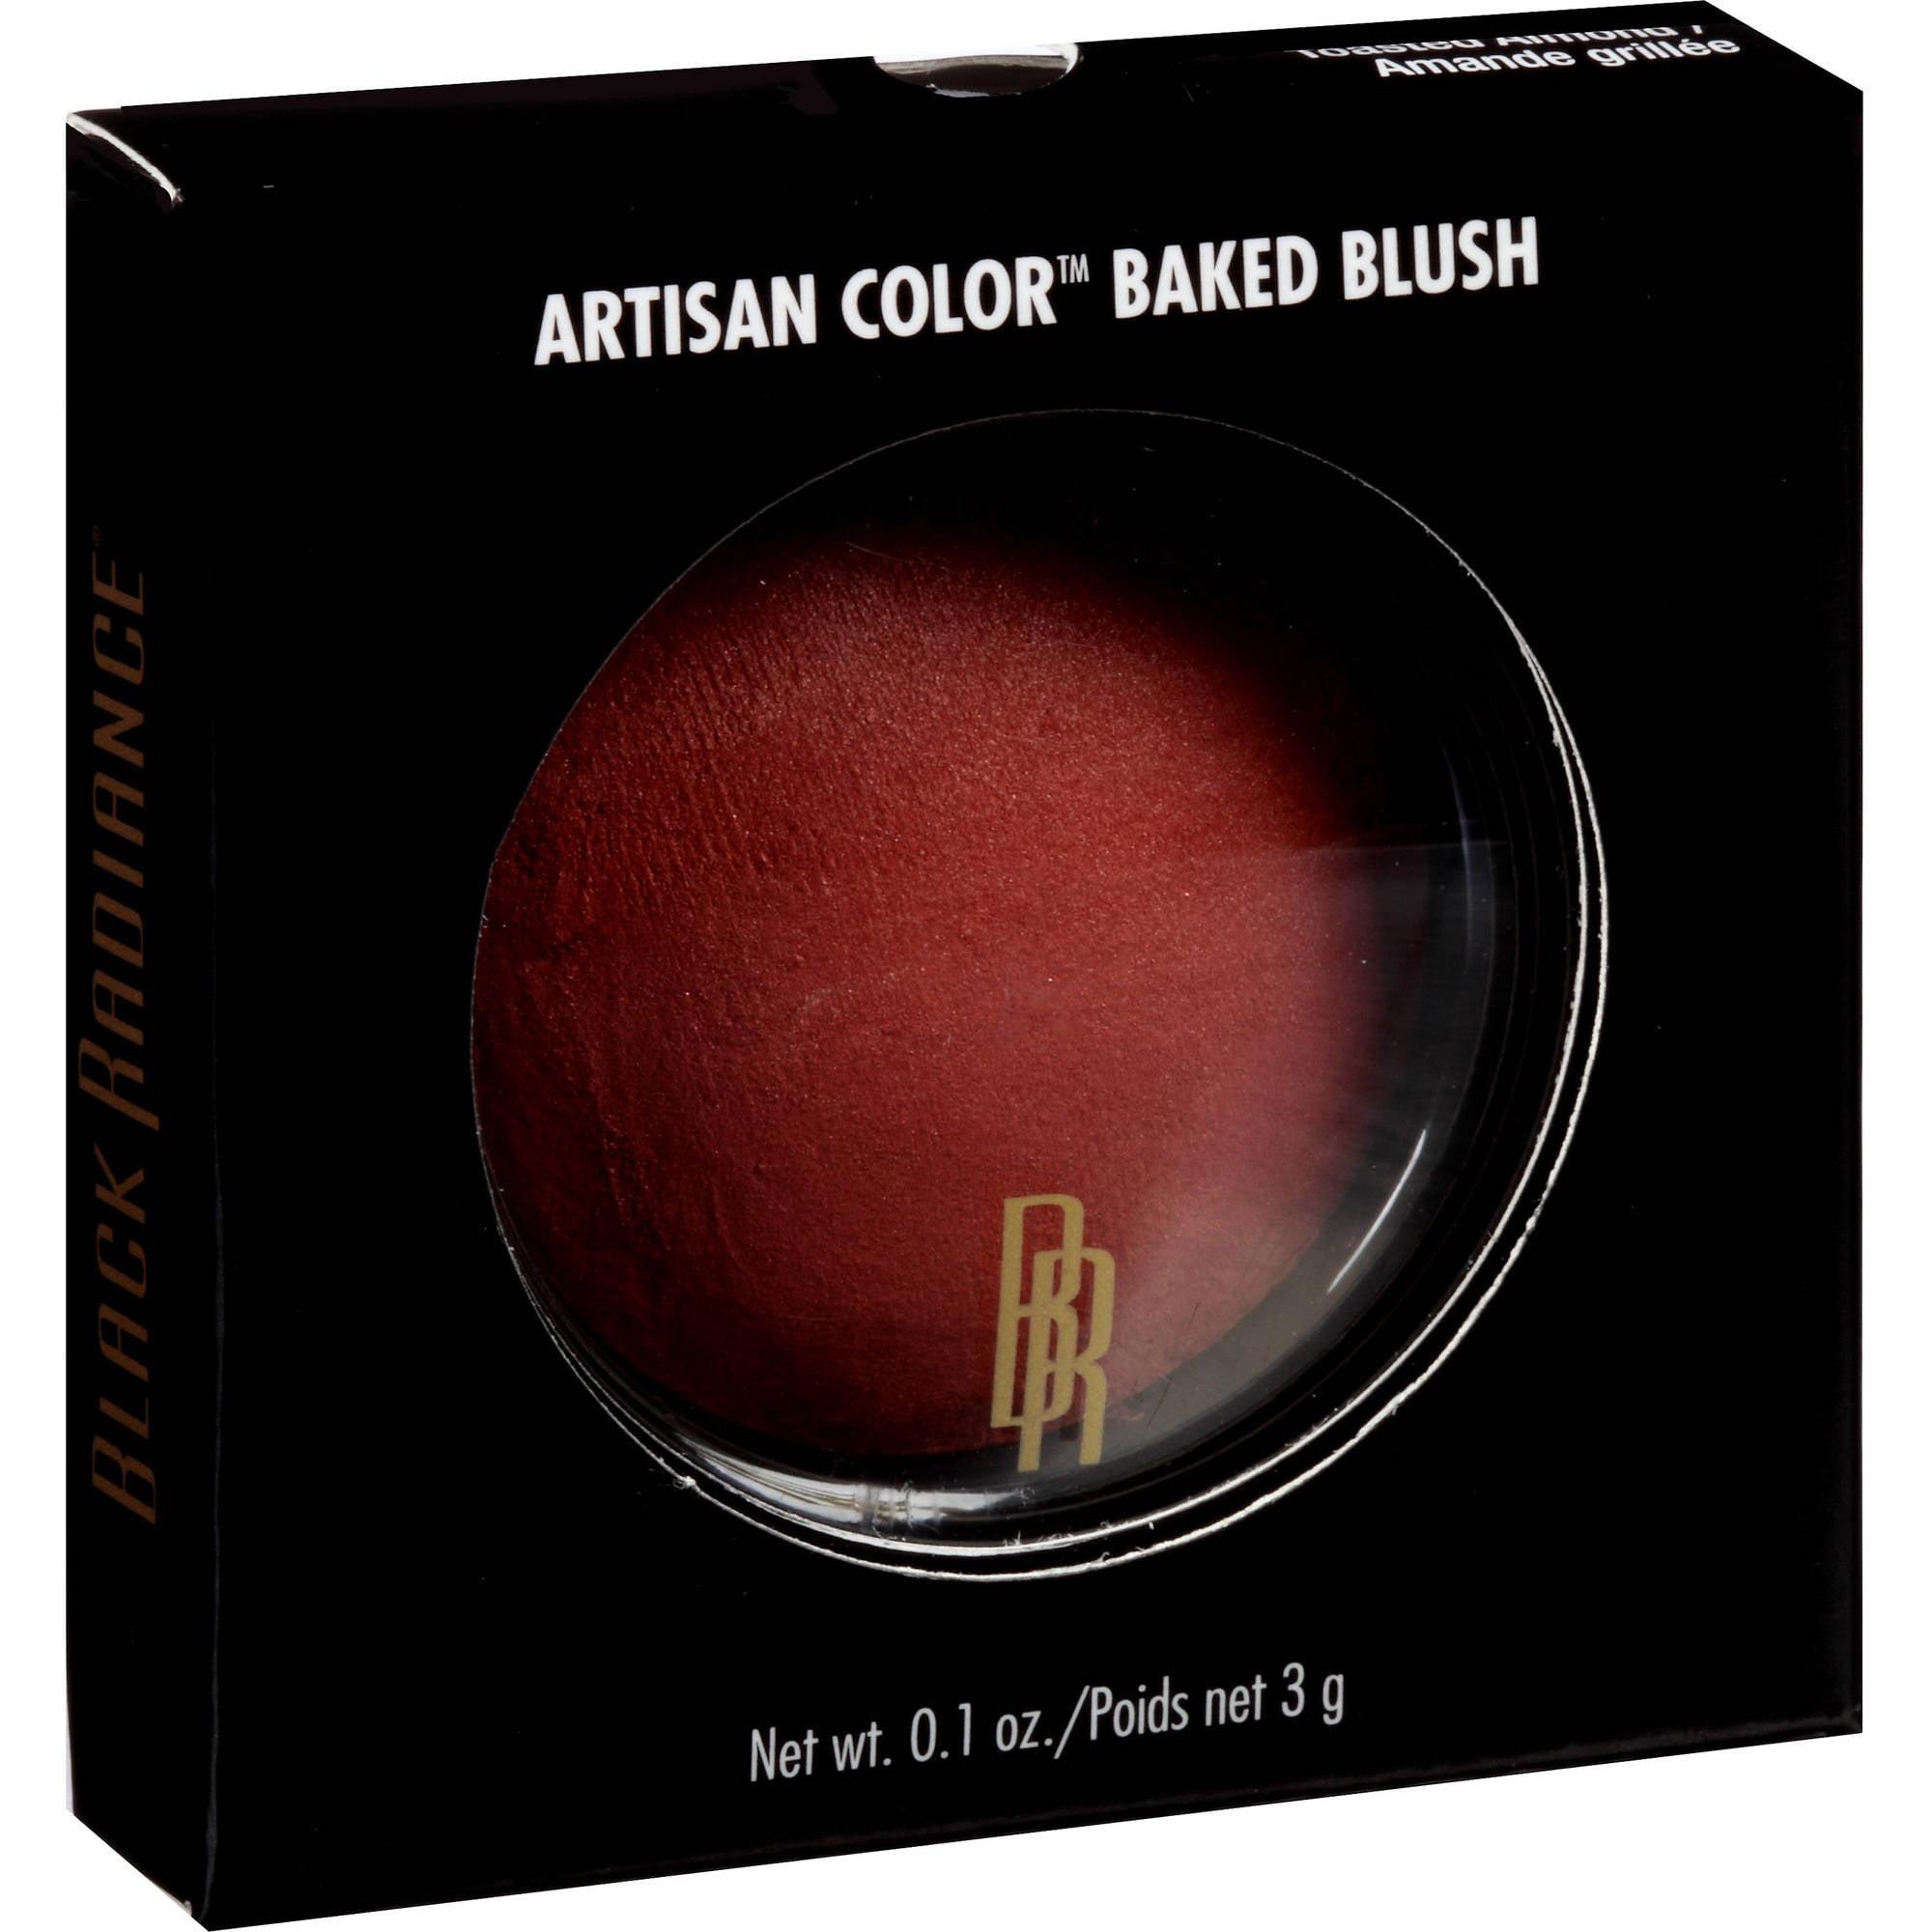 Black Radiance Artisan Color Baked Blush, Toasted Almond 8306, 0.1 oz